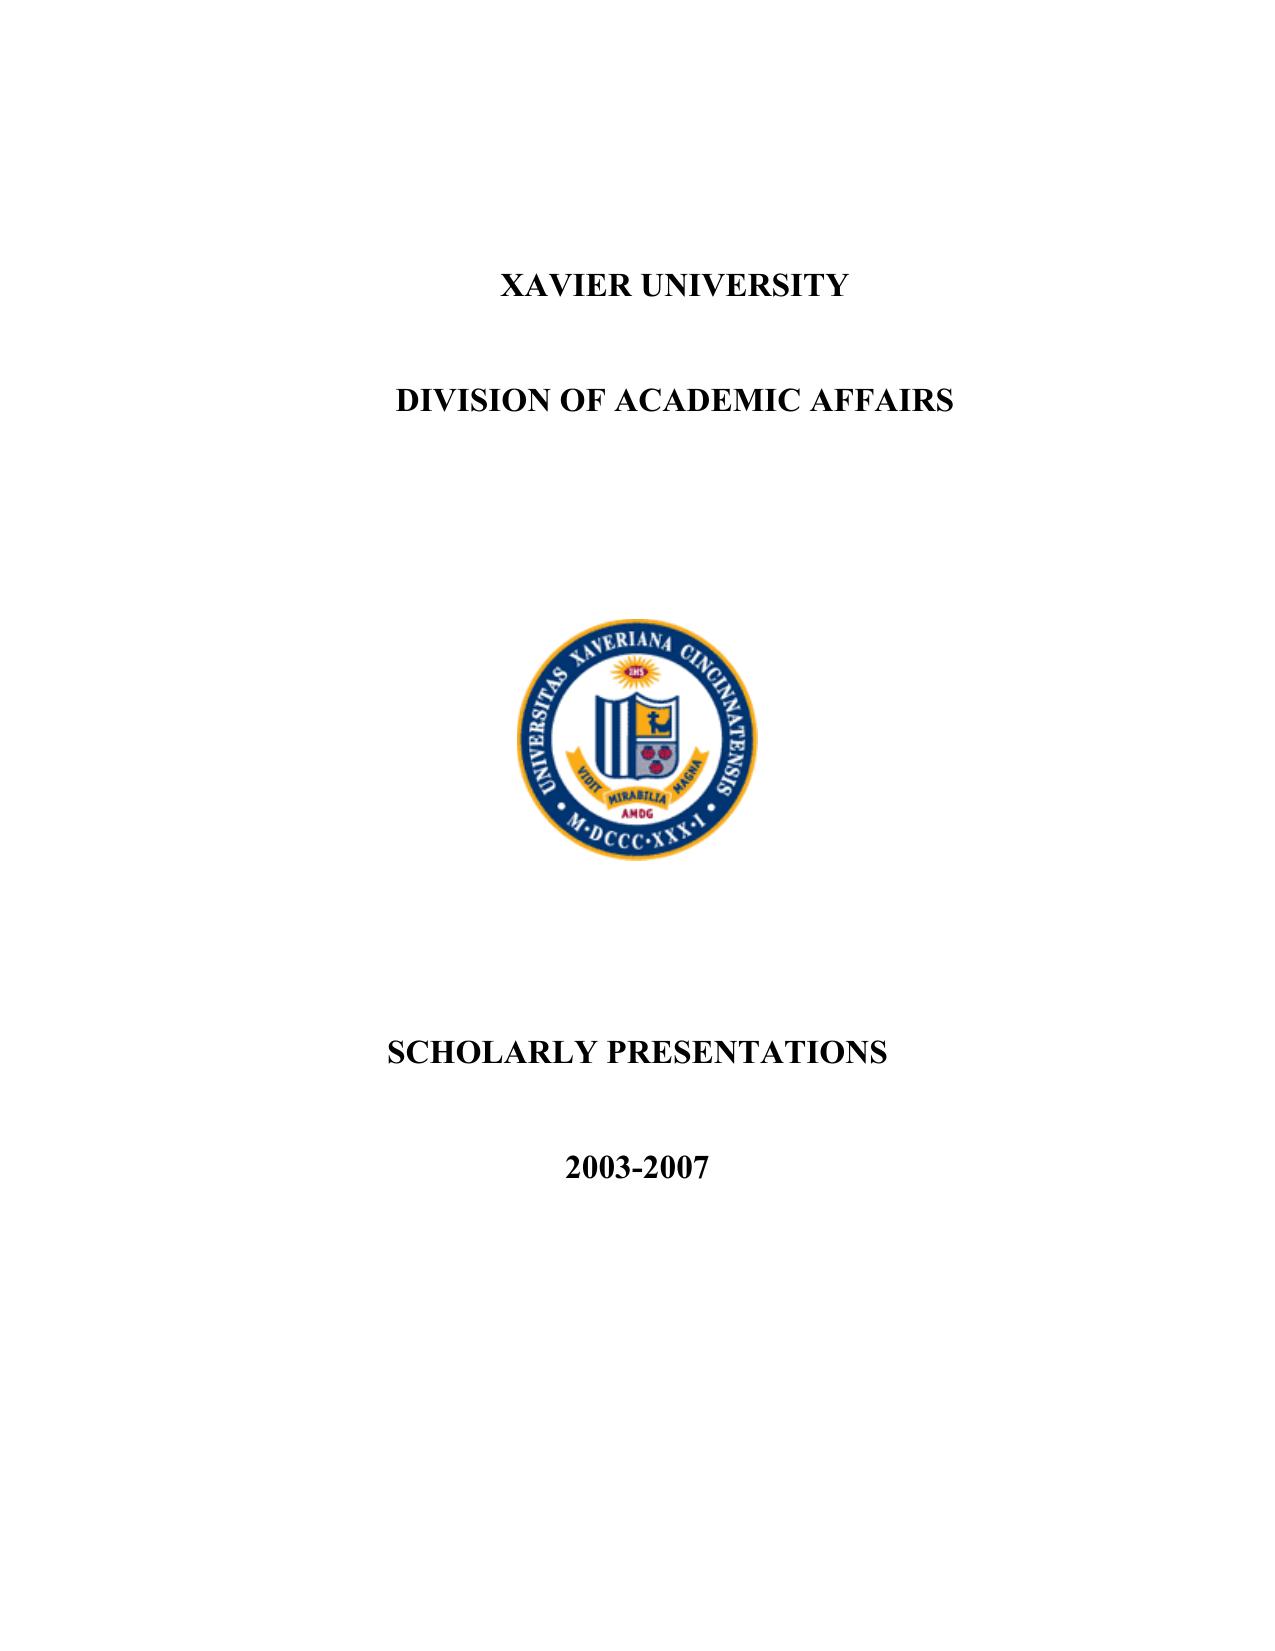 XAVIER UNIVERSITY DIVISION OF ACADEMIC AFFAIRS SCHOLARLY PRESENTATIONS 7cfef29c1